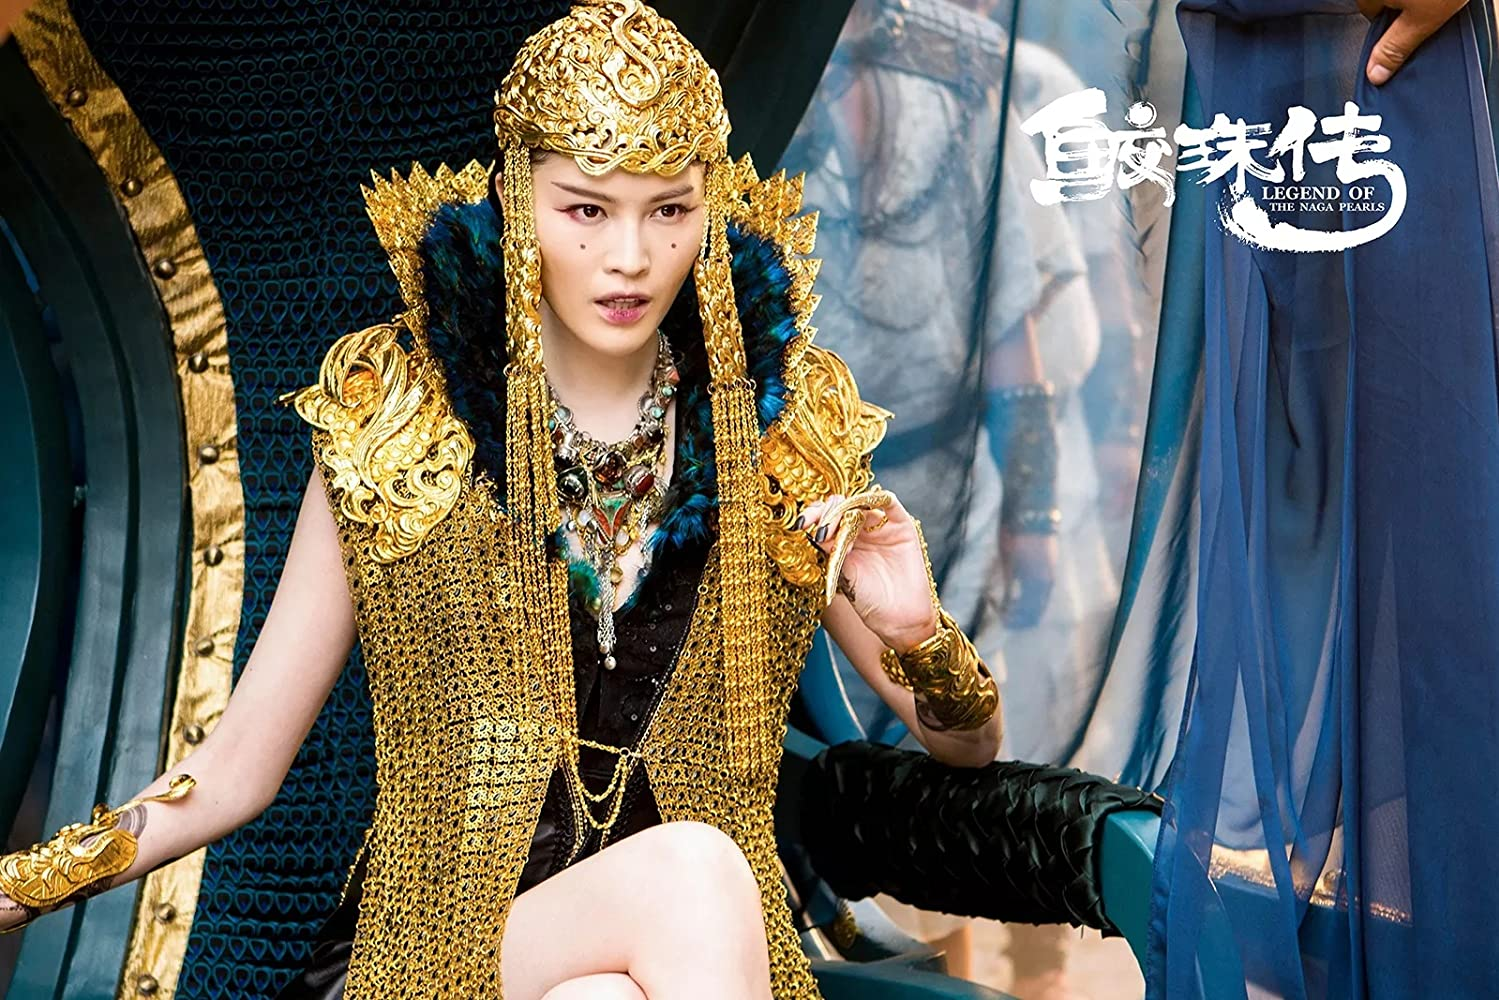 Legend of the Naga Pearls (2017) Online Subtitrat in Romana